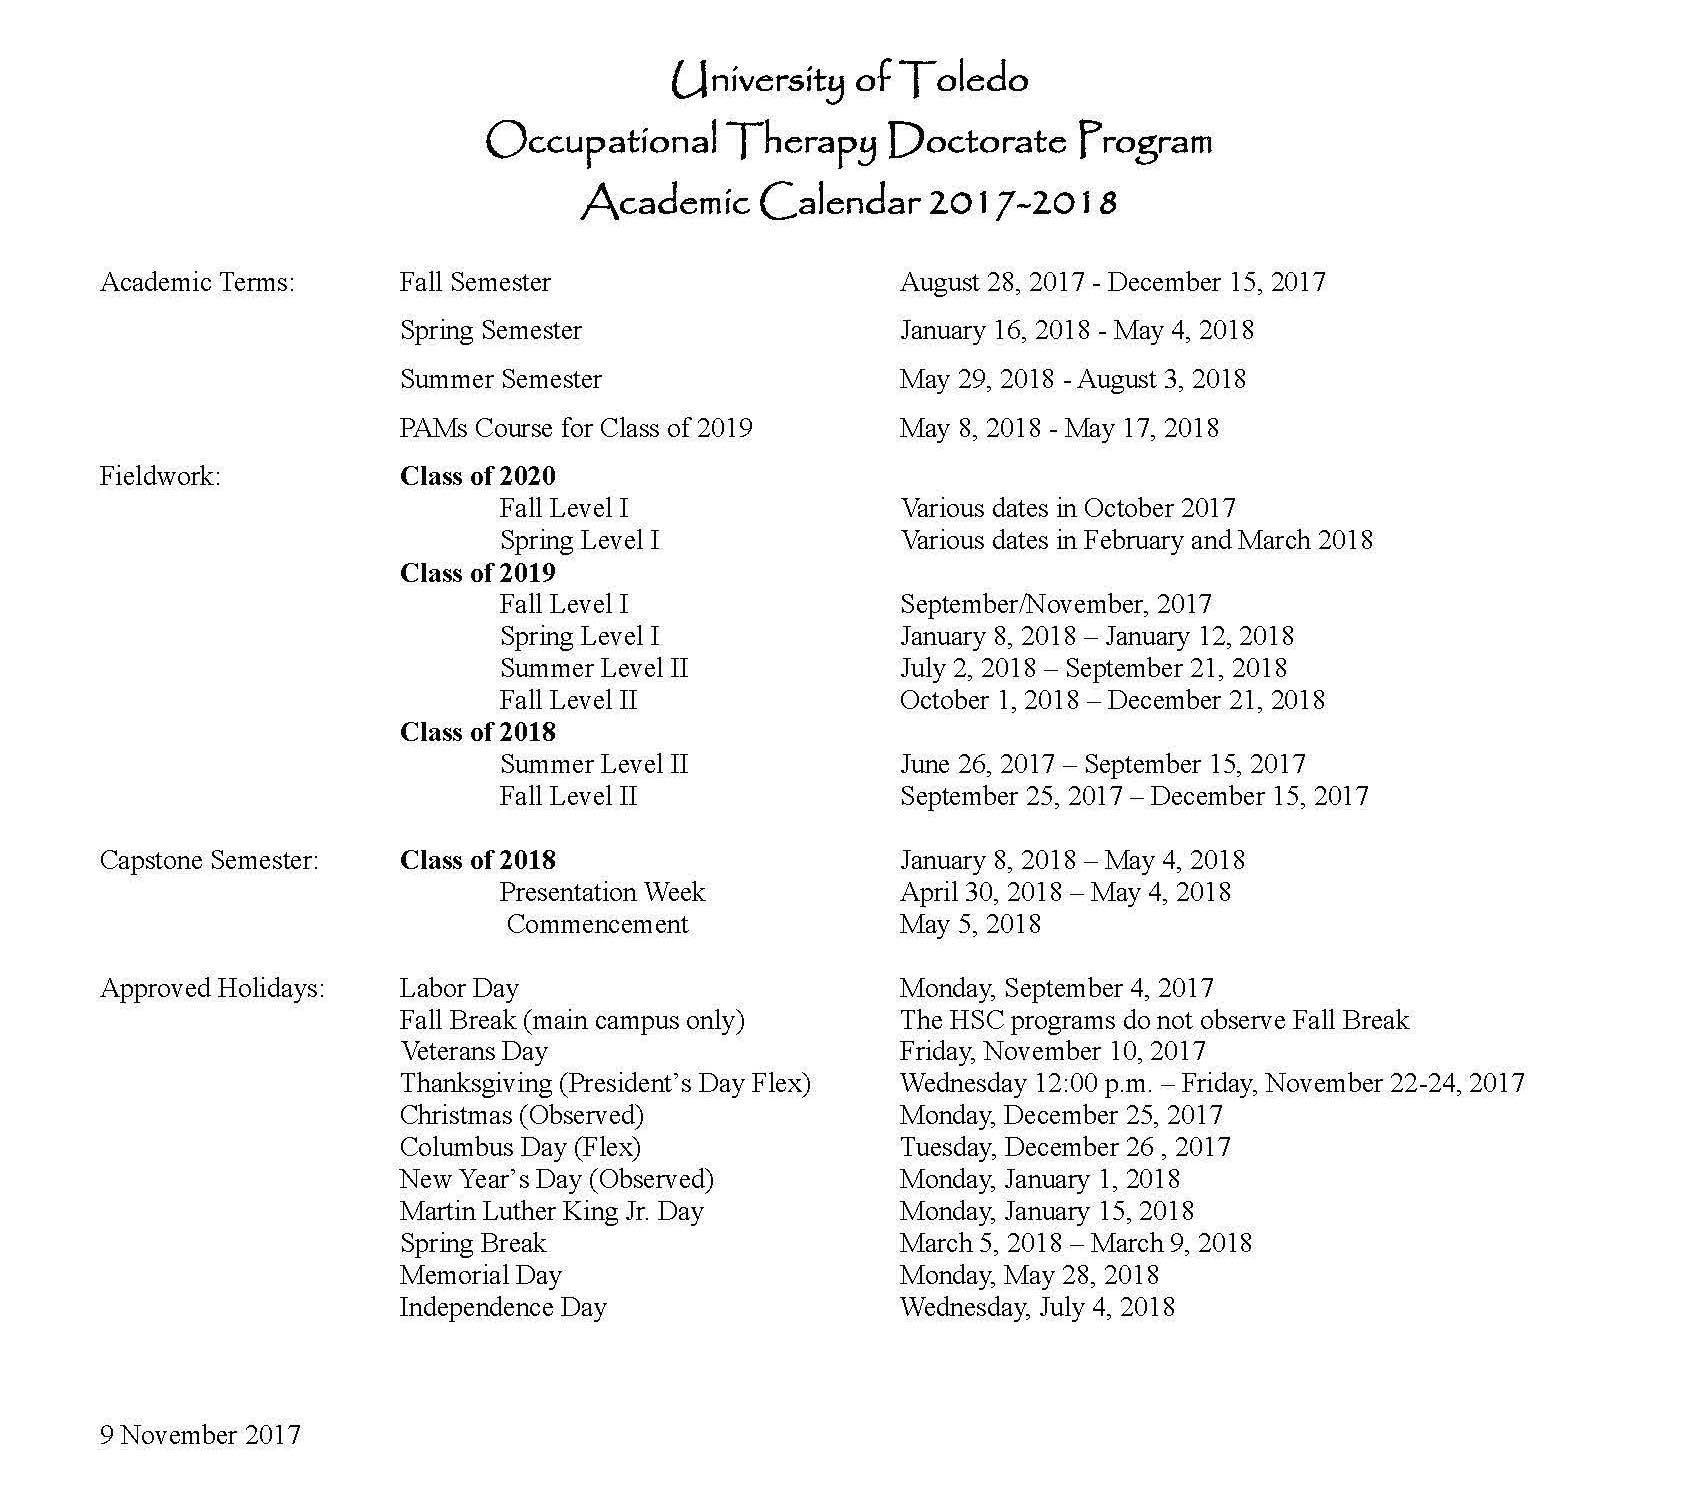 Otd Calendar pertaining to University Toledo Academic Calendar